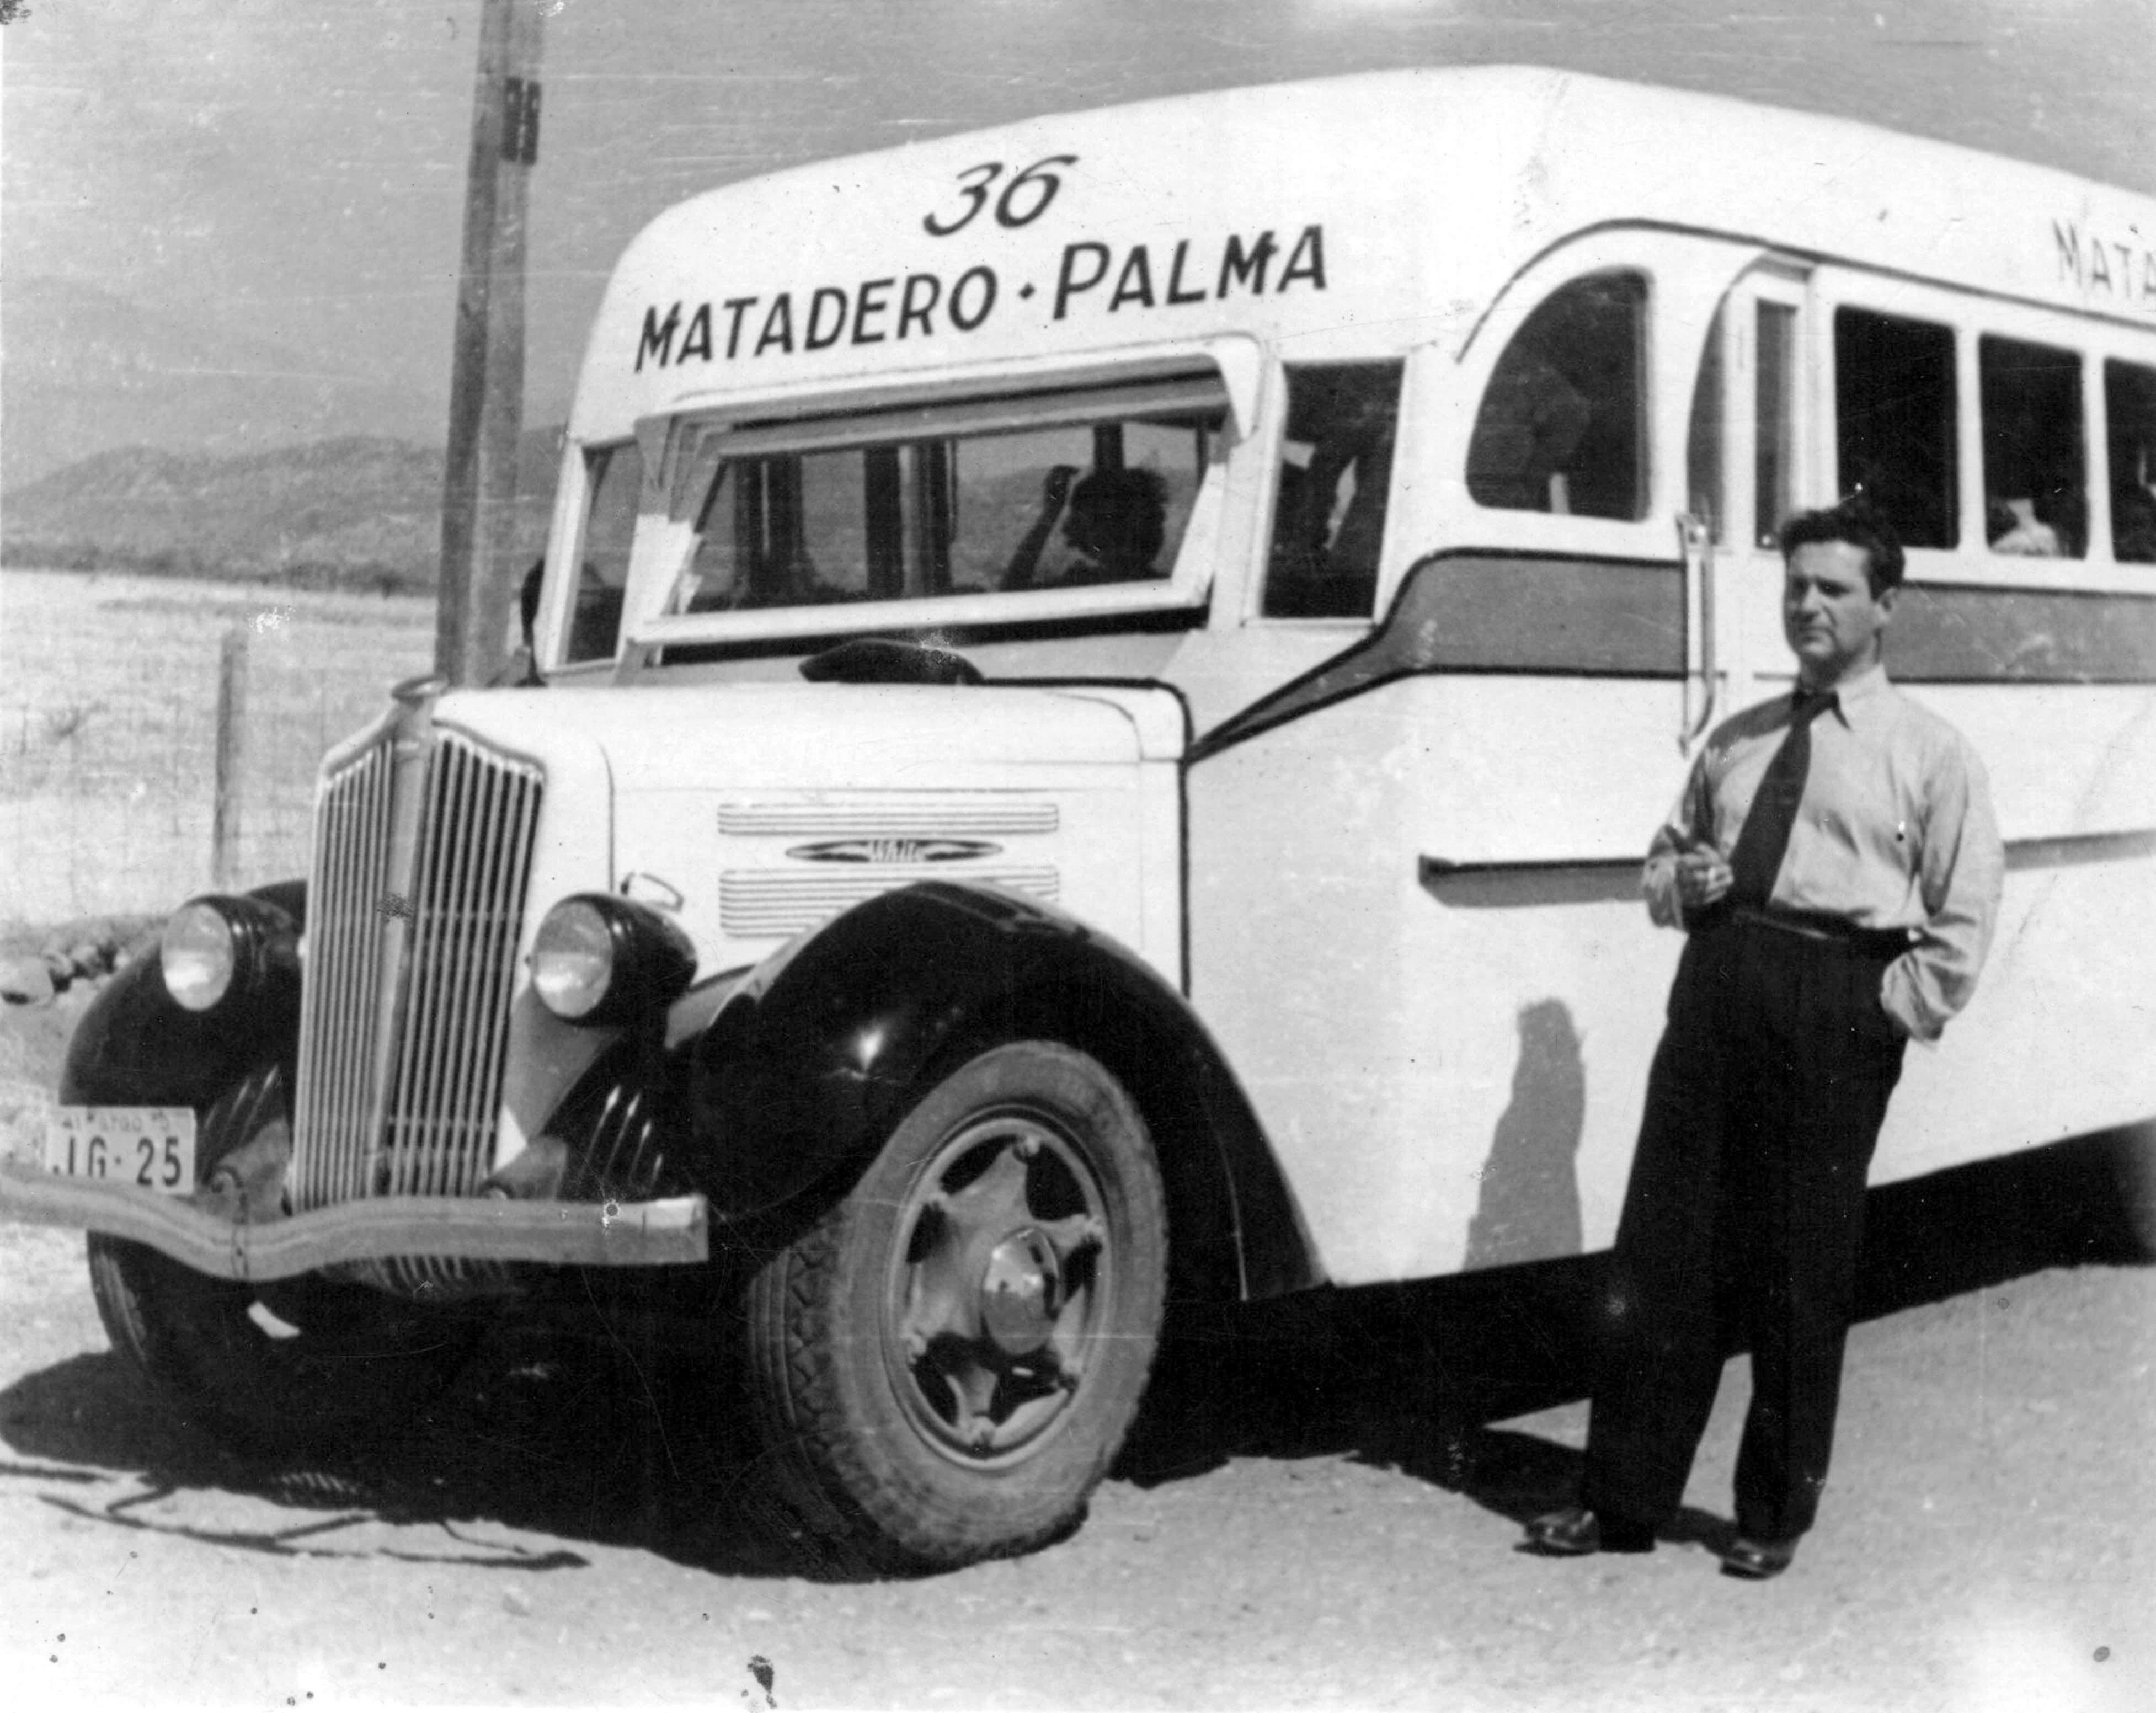 Enterreno - Fotos históricas de chile - fotos antiguas de Chile - Bus Matadero Palma, 1940